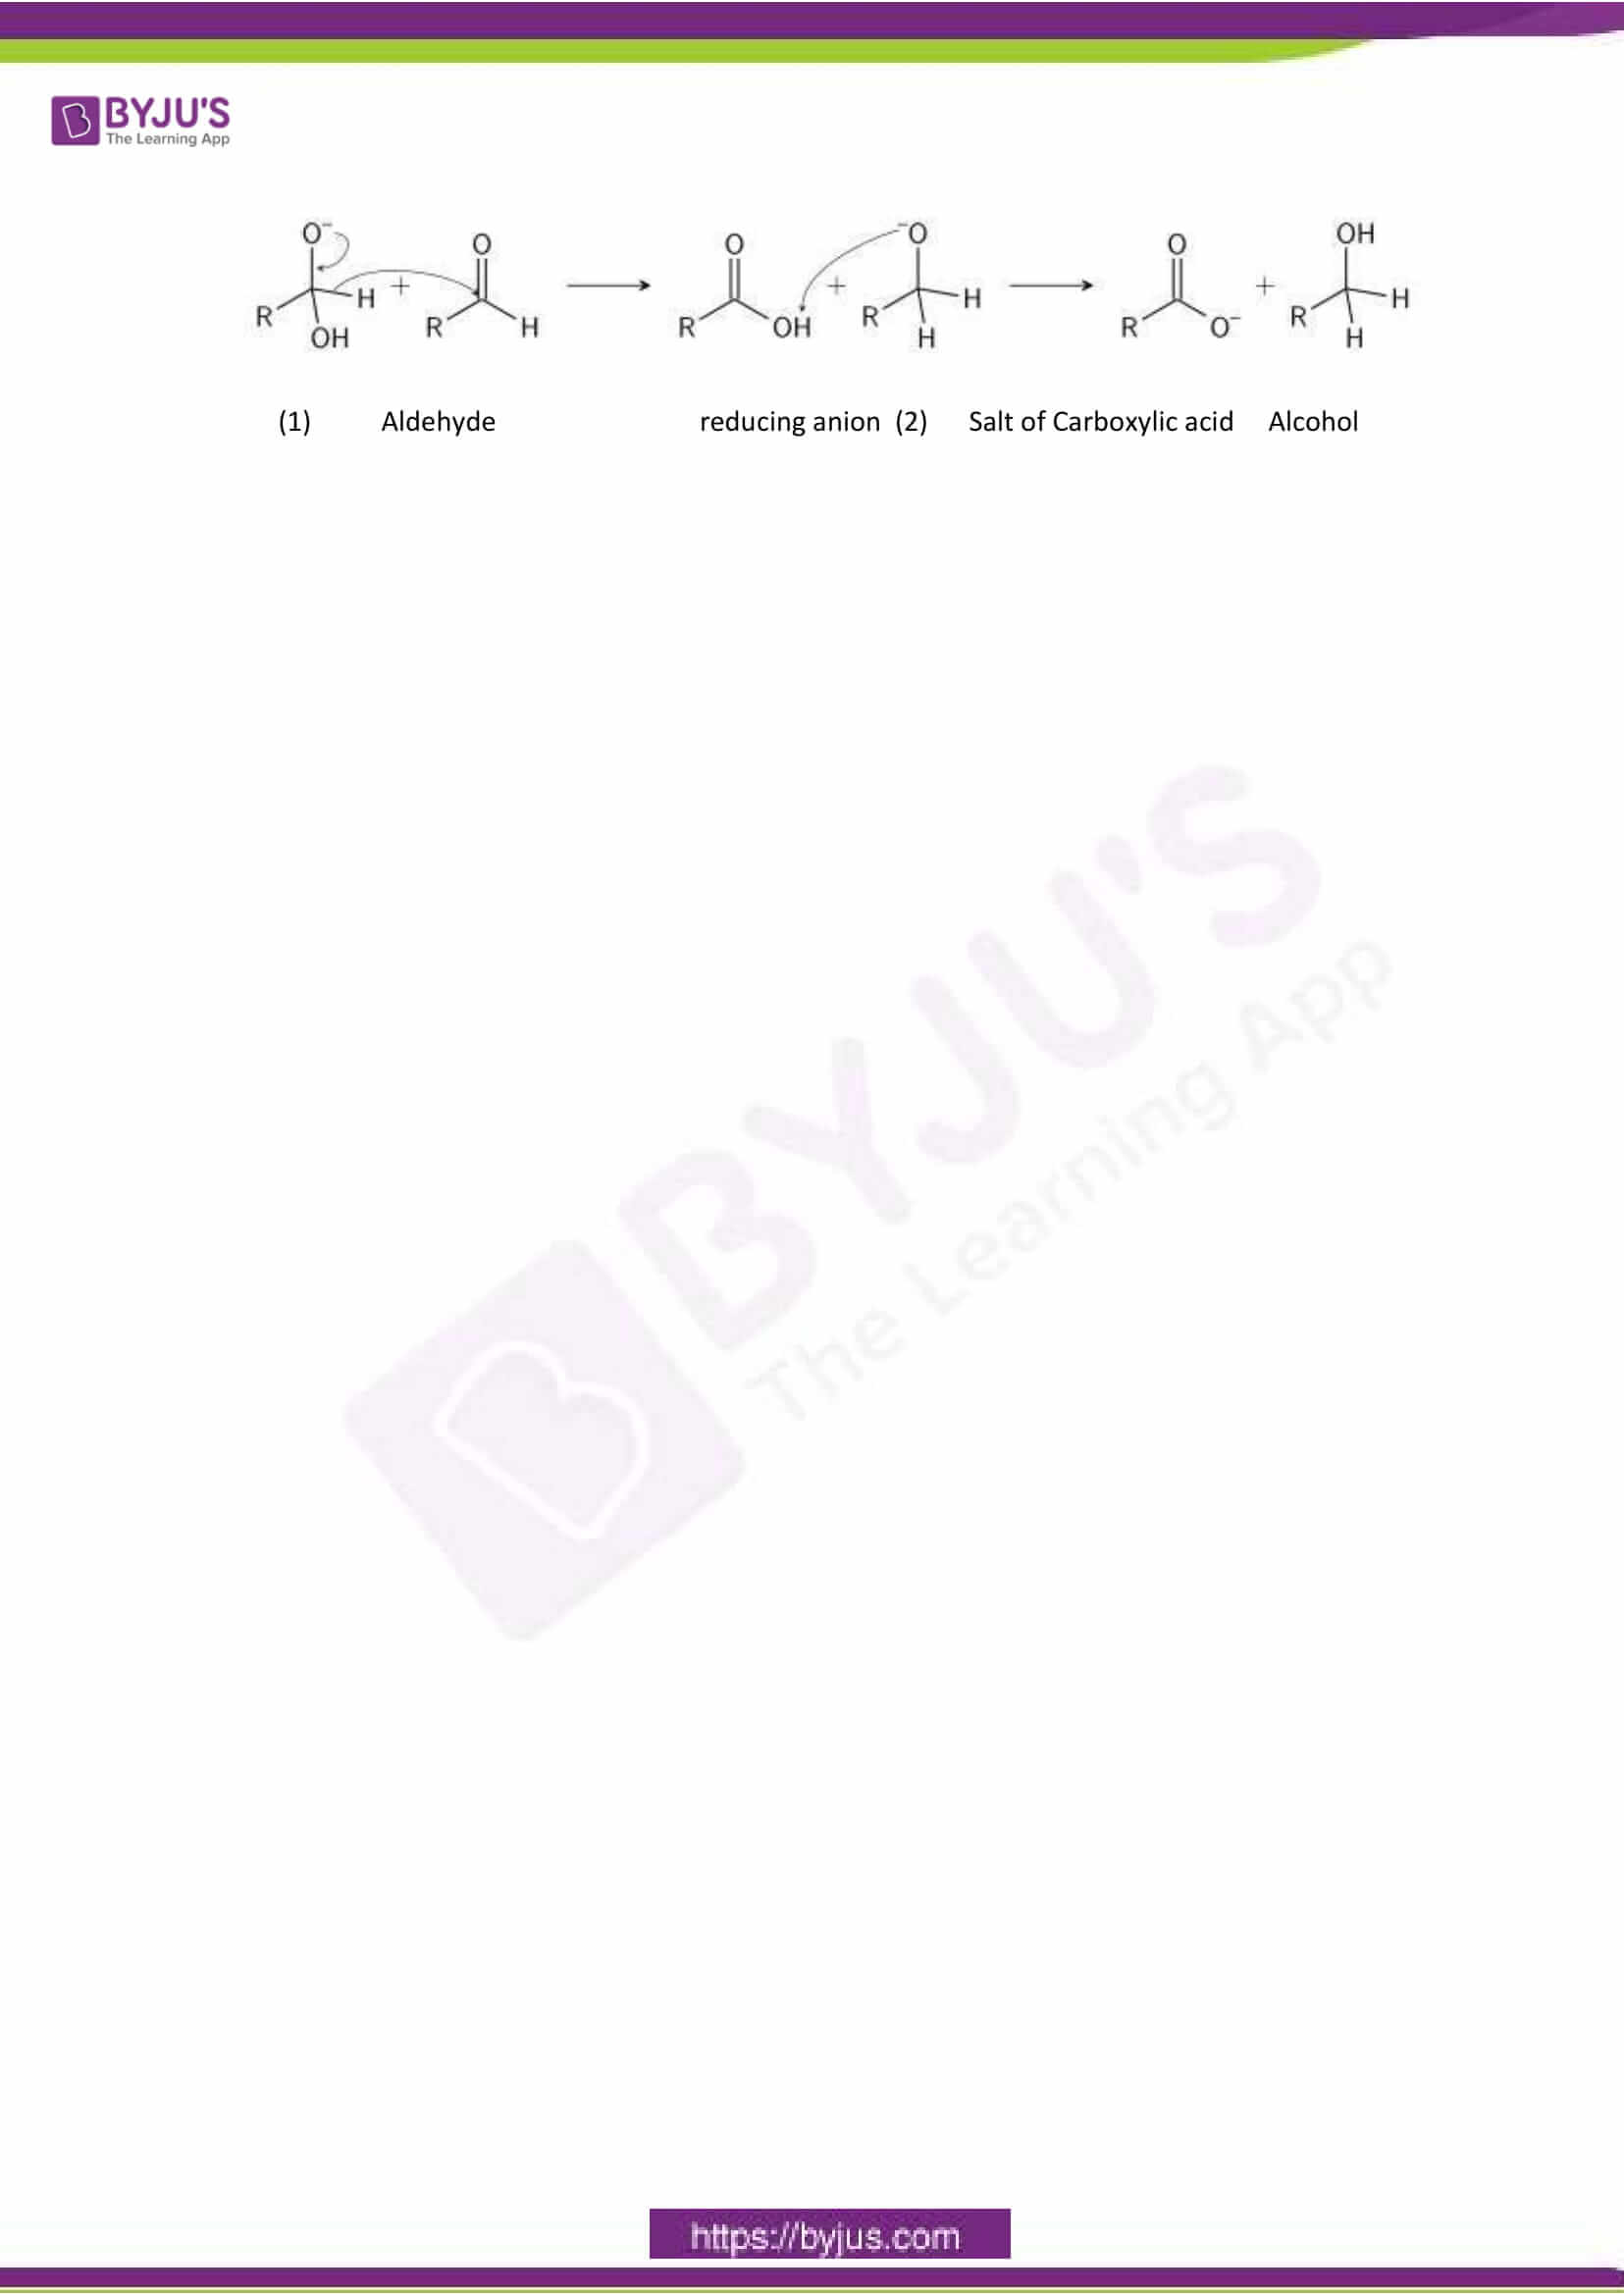 cbse class 12 chemistry sample paper solution set 2